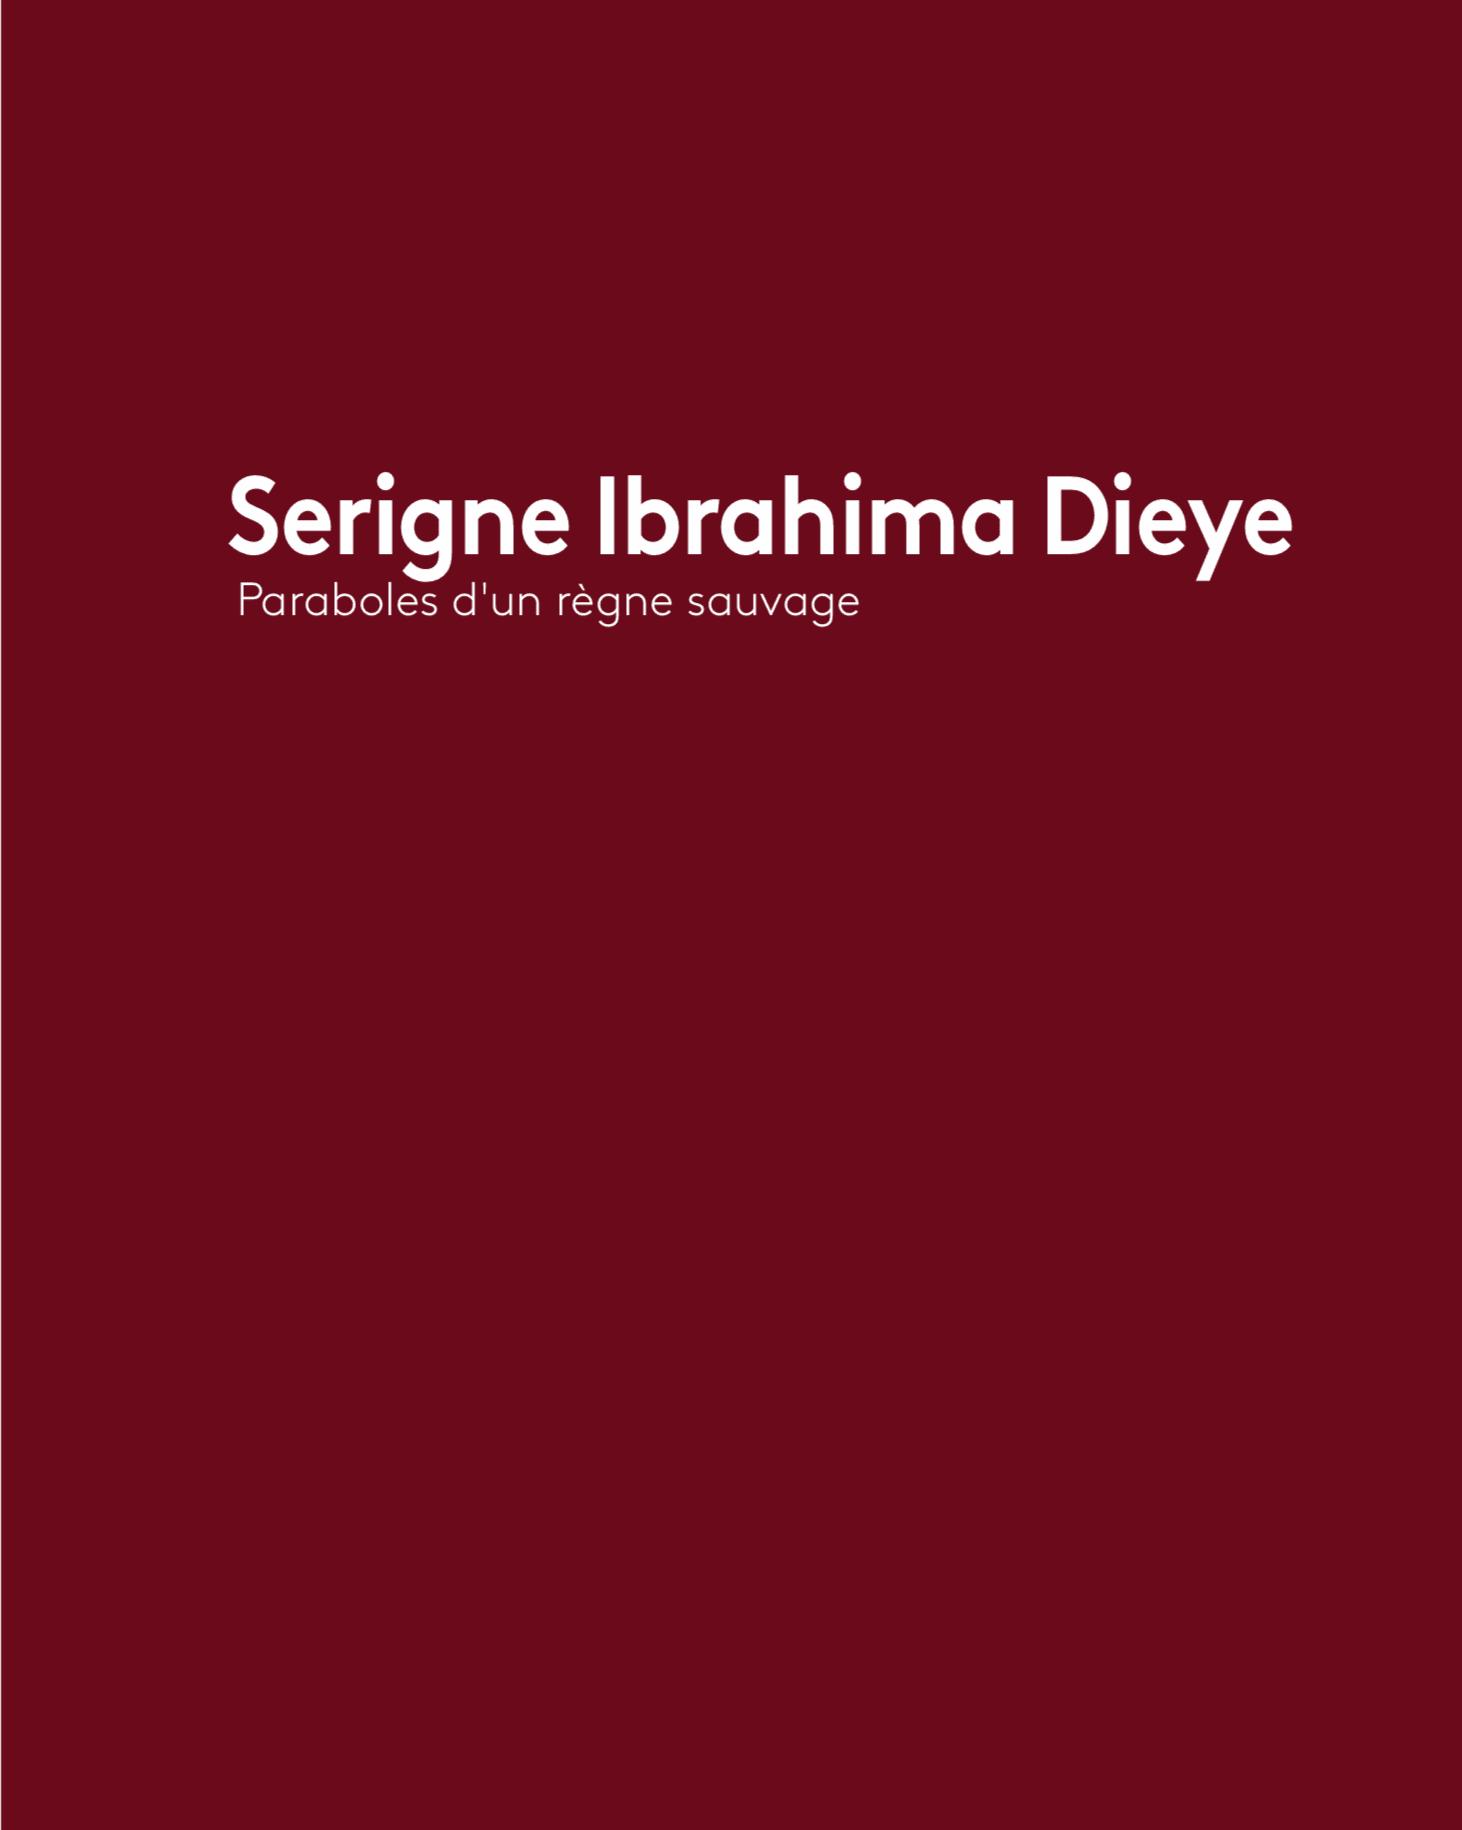 Serigne Ibrahima Dieye - Paraboles d'un règne sauvage